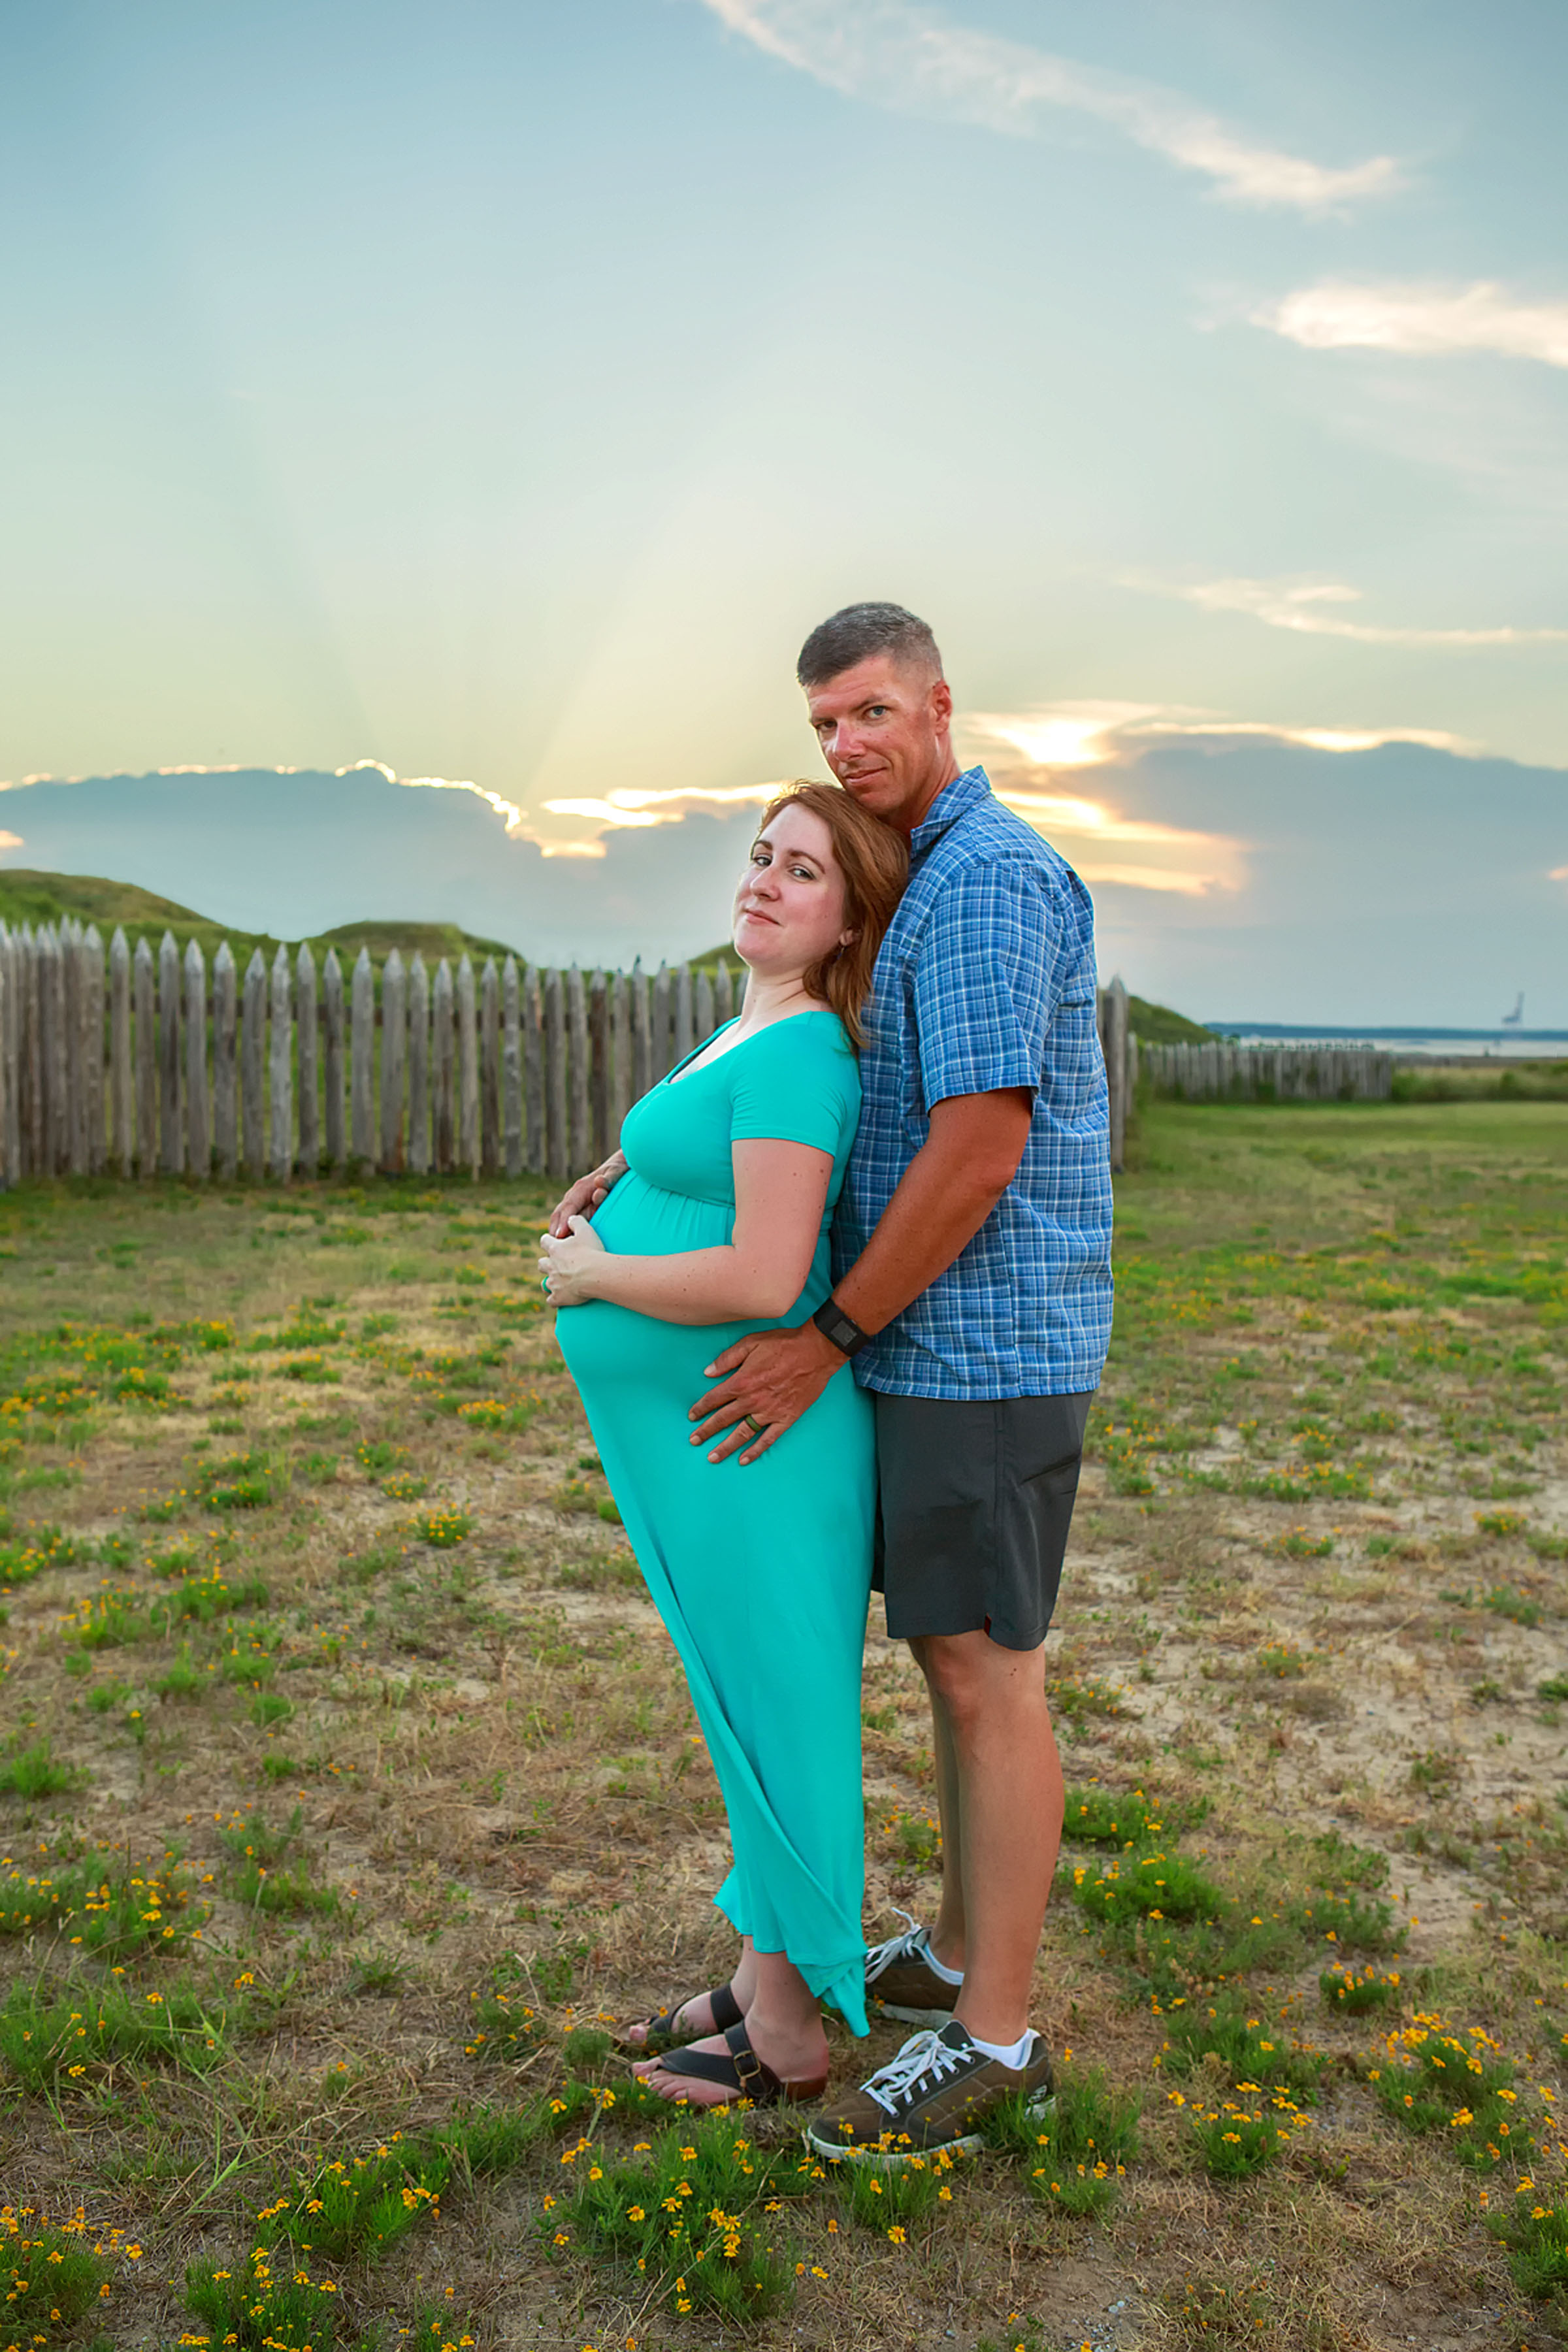 Fort_Fisher_Maternity_Photographer_Tiffany_Abruzzo_17.jpg